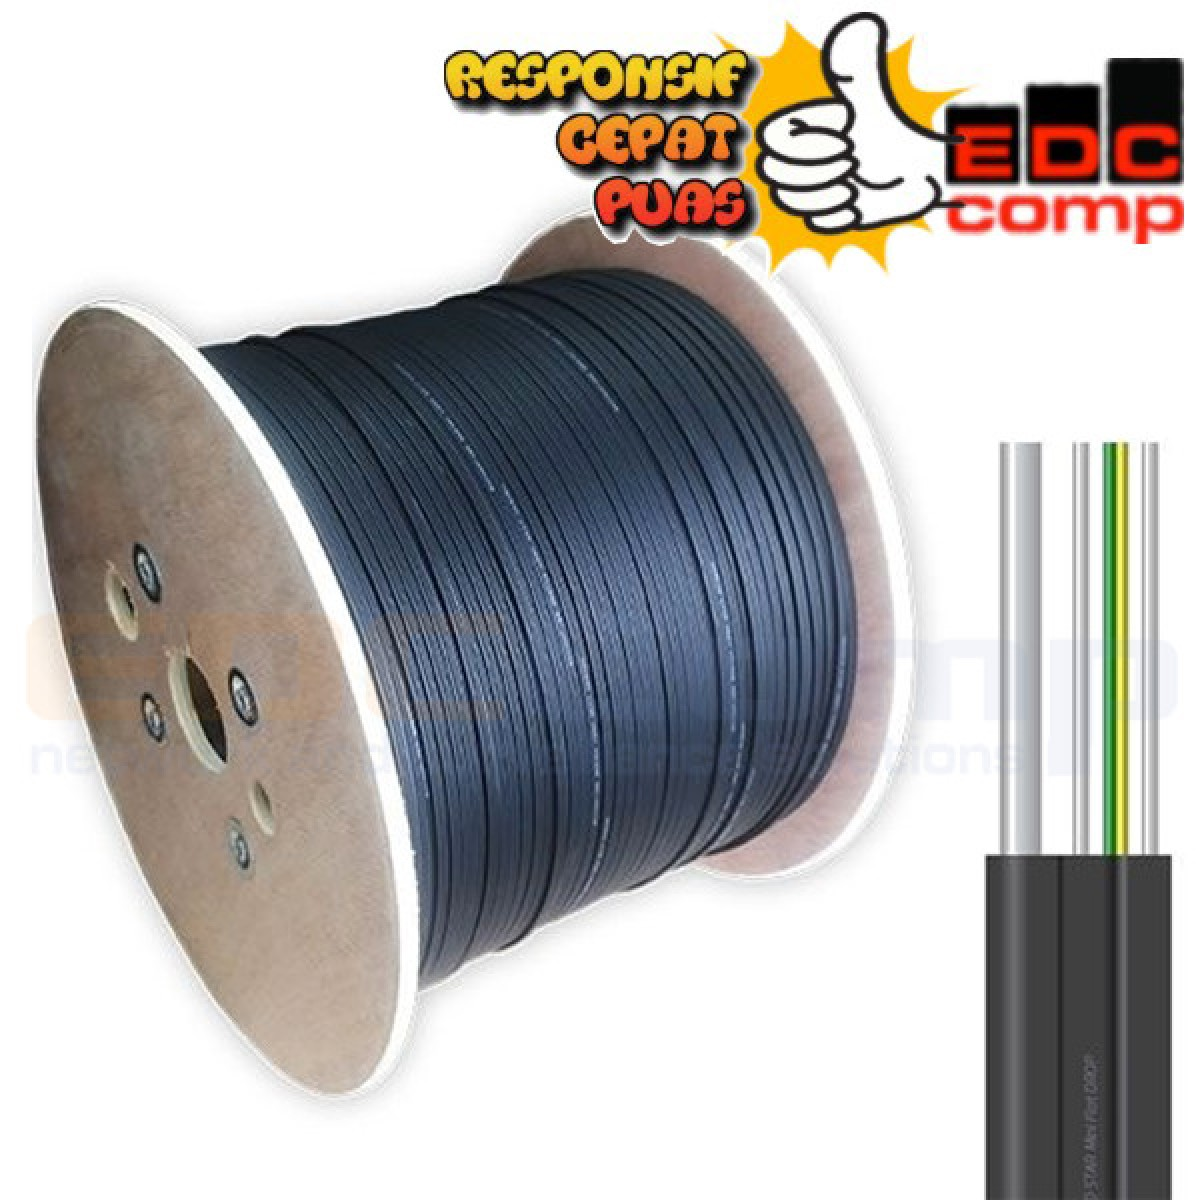 Kabe Fiber Optic Drop Core 2 Core SM/Cable FO Drop Core SM 2 Core - EdcComp